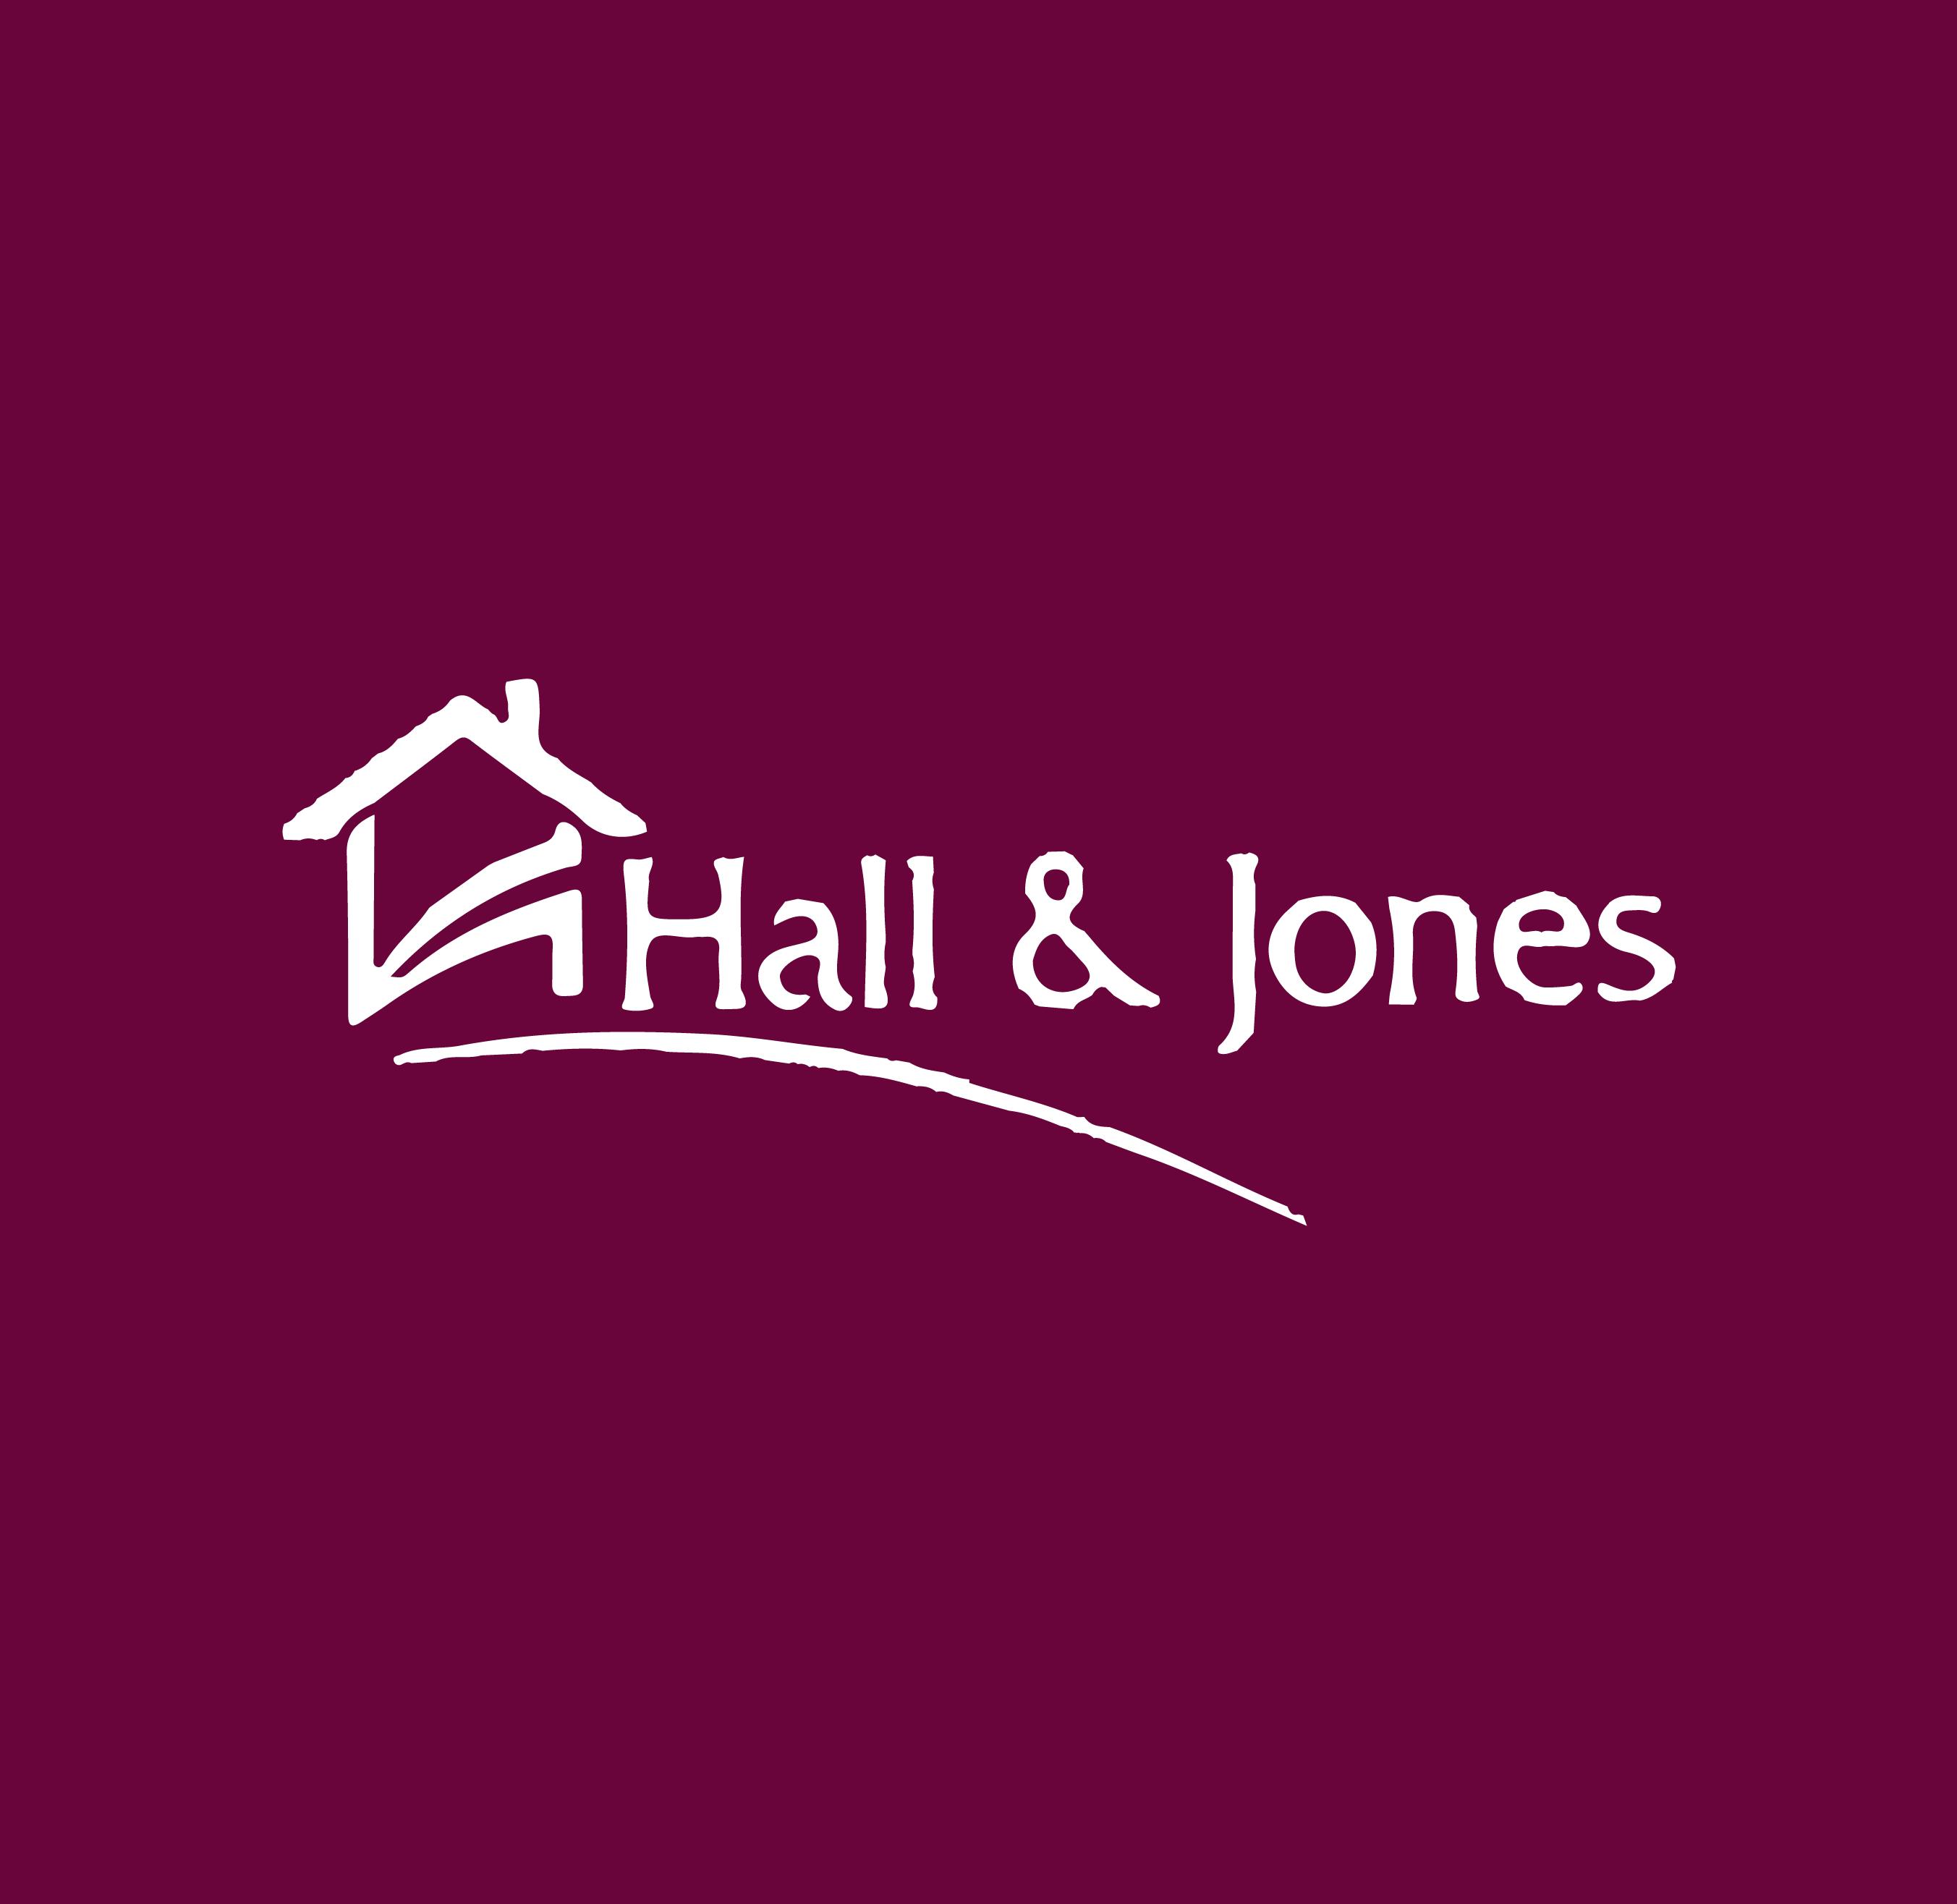 Hall & Jones